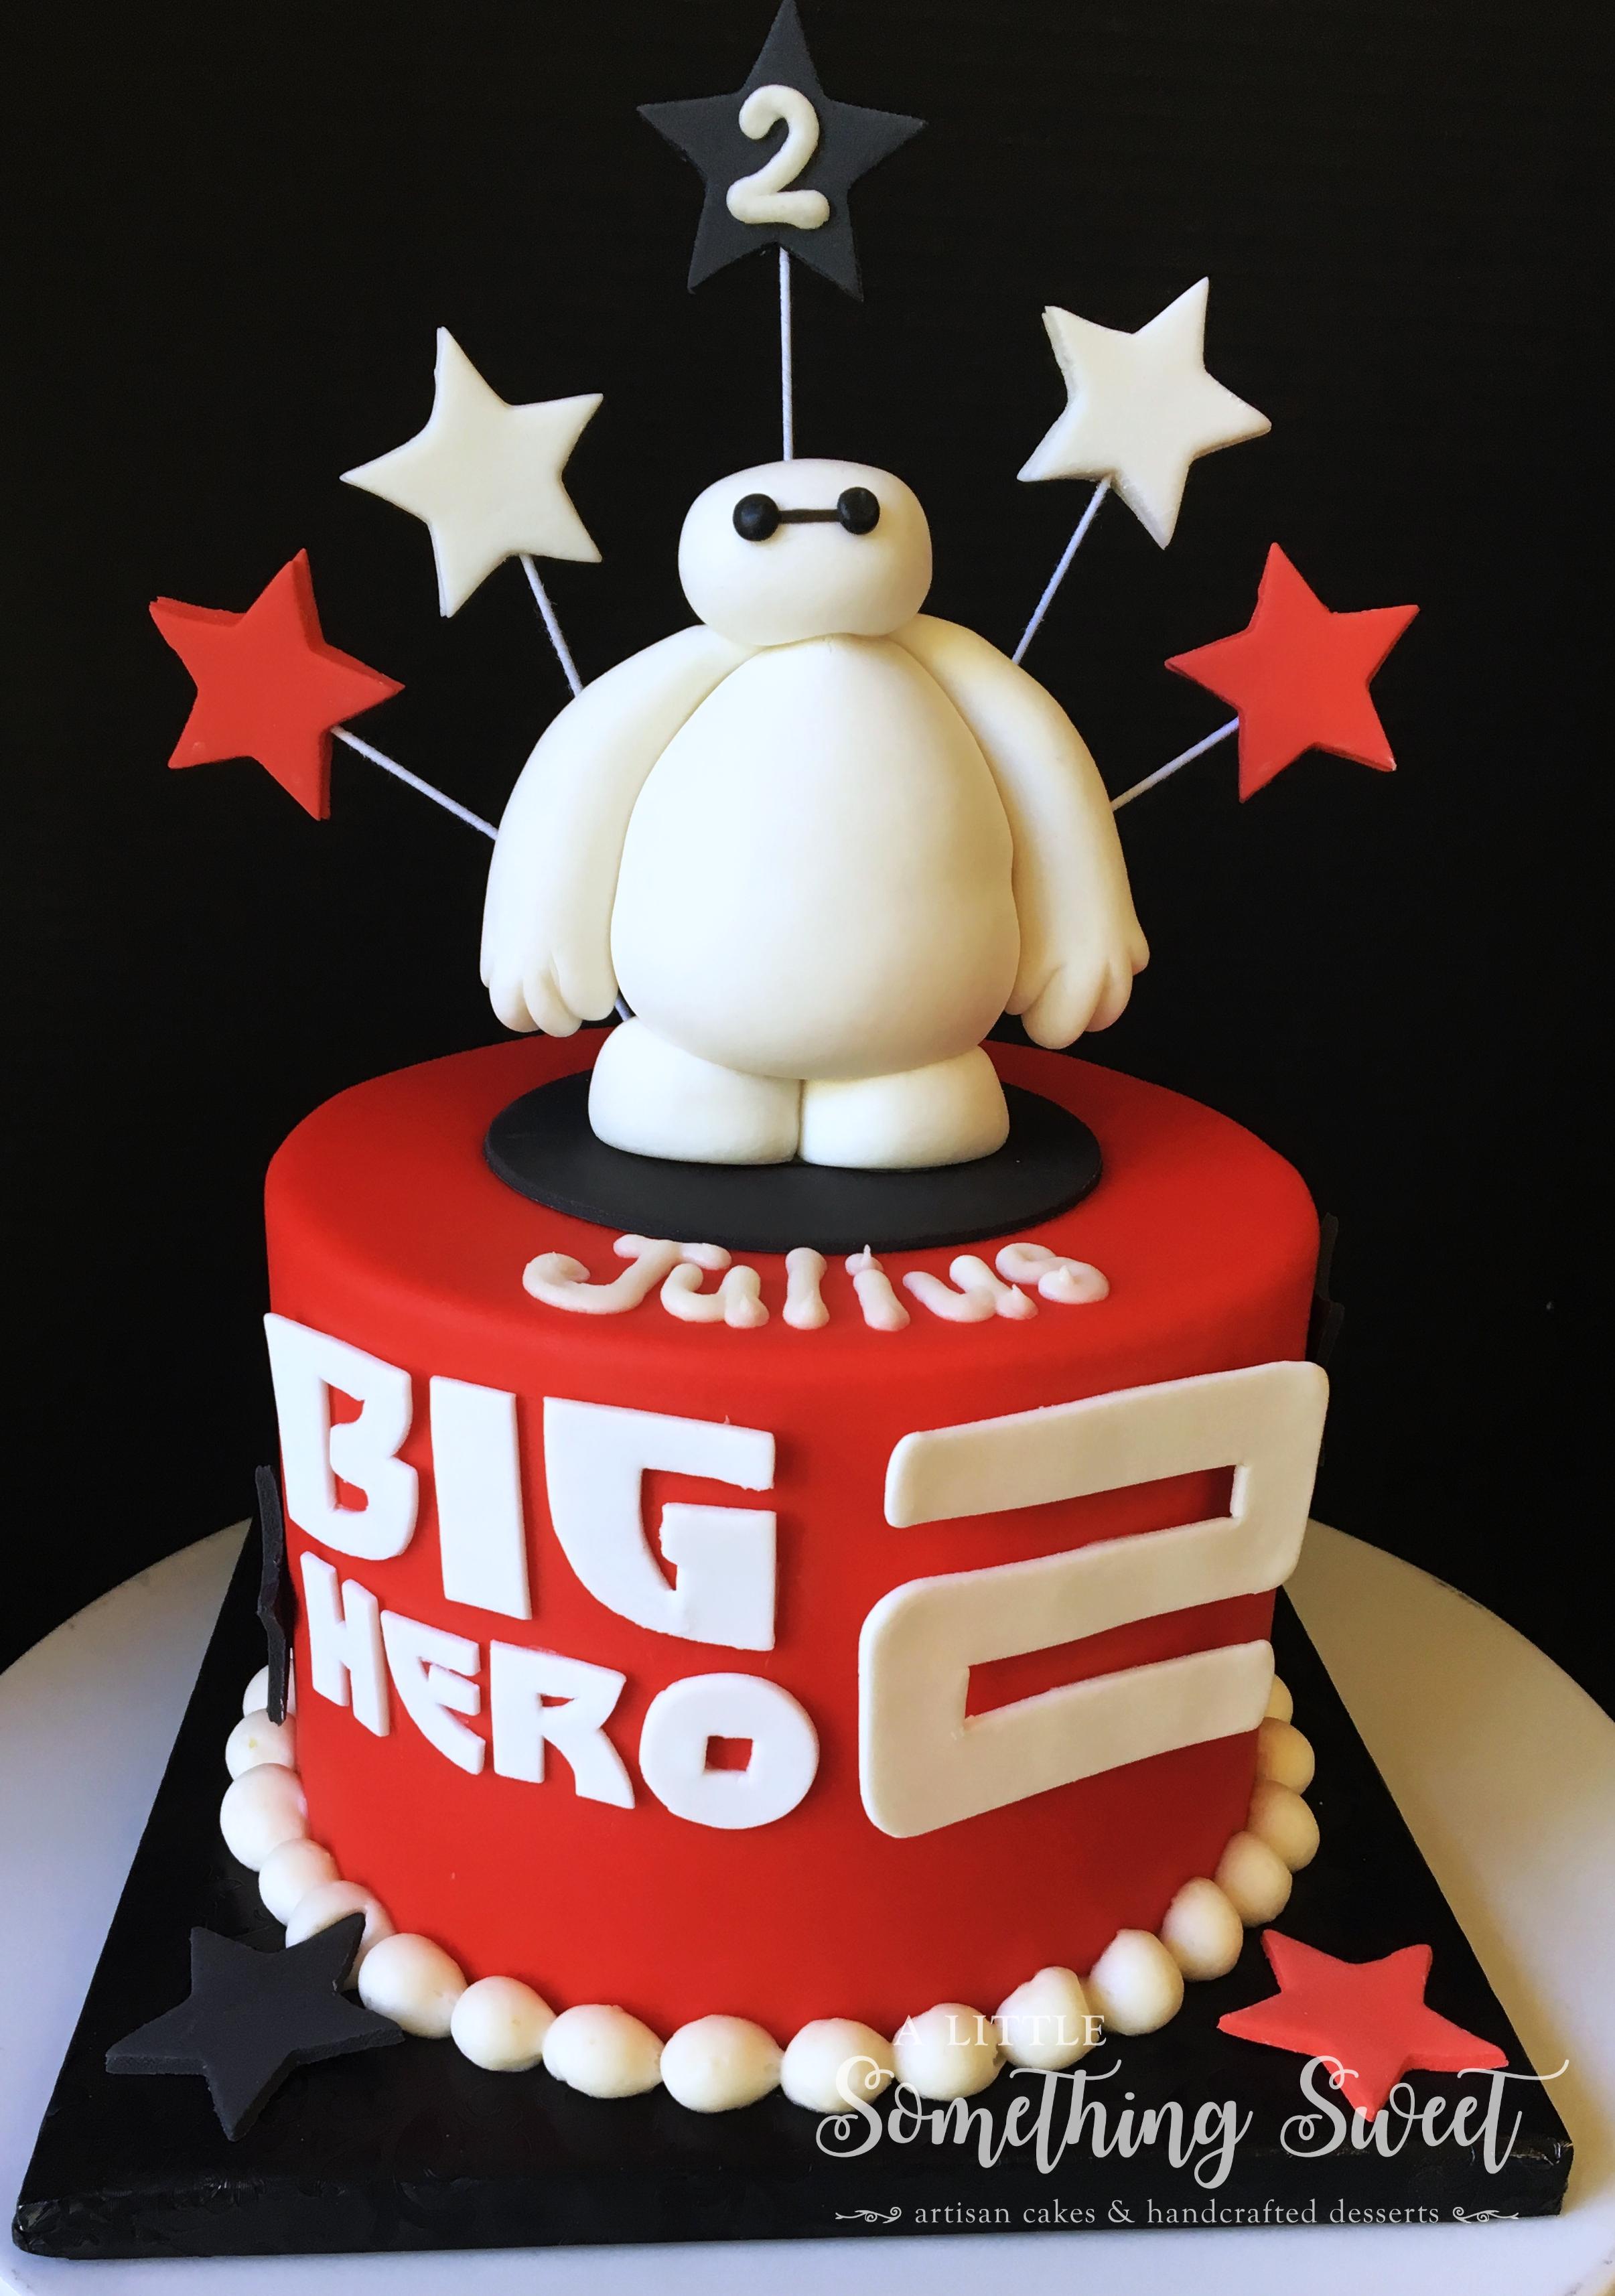 Big Hero 5